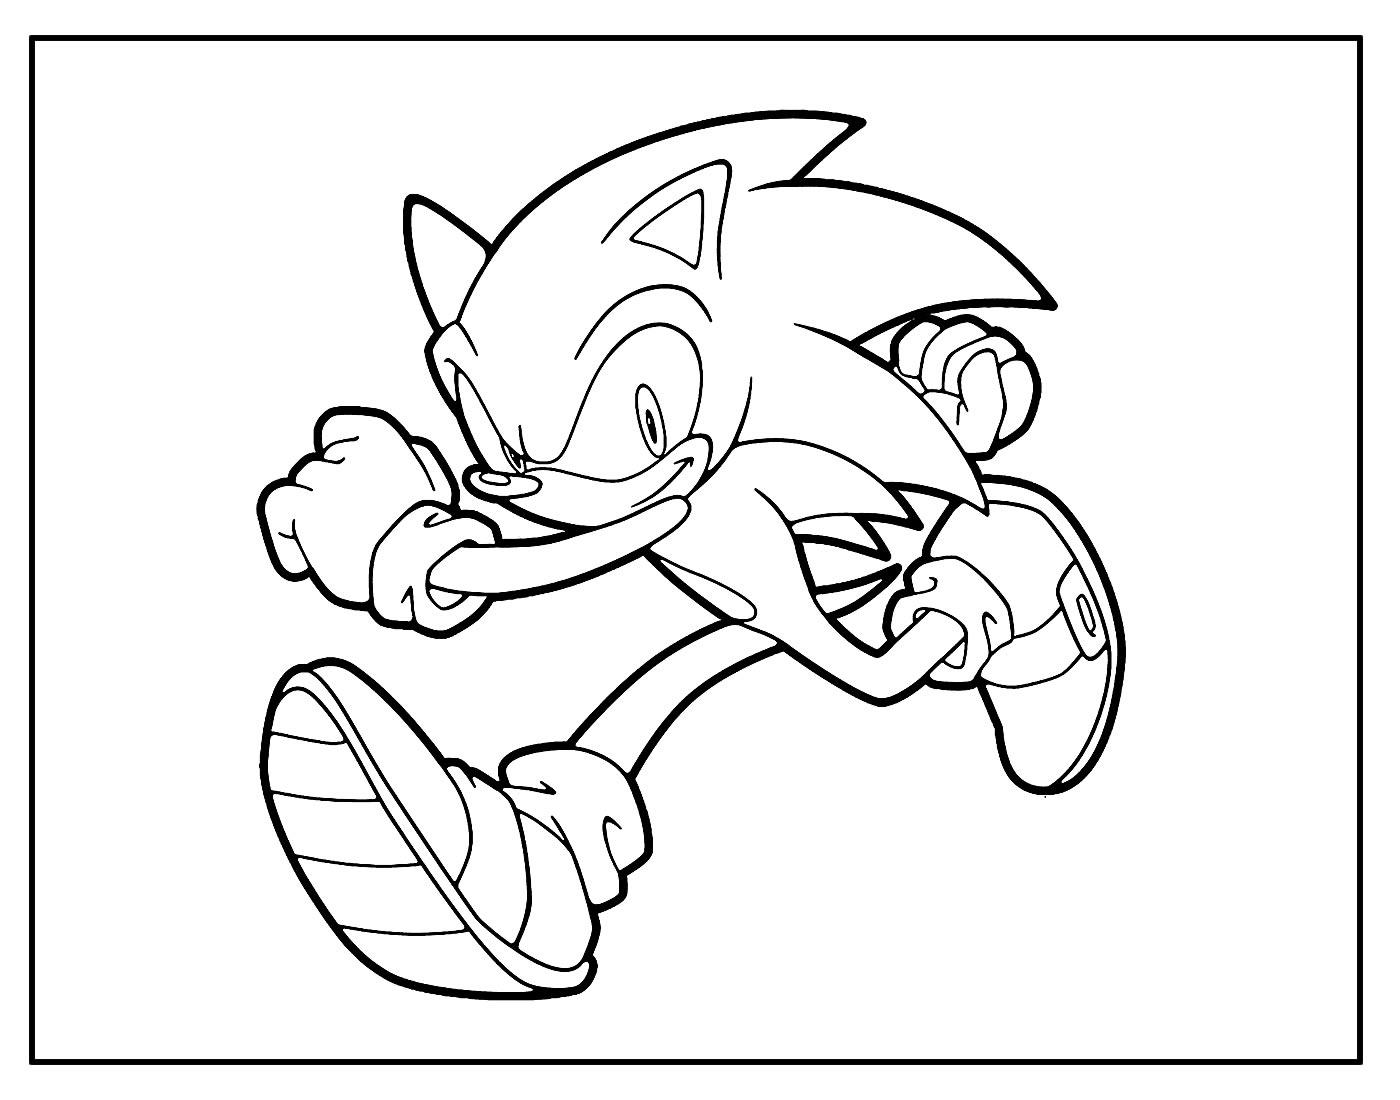 Desenho para pintar de Sonic